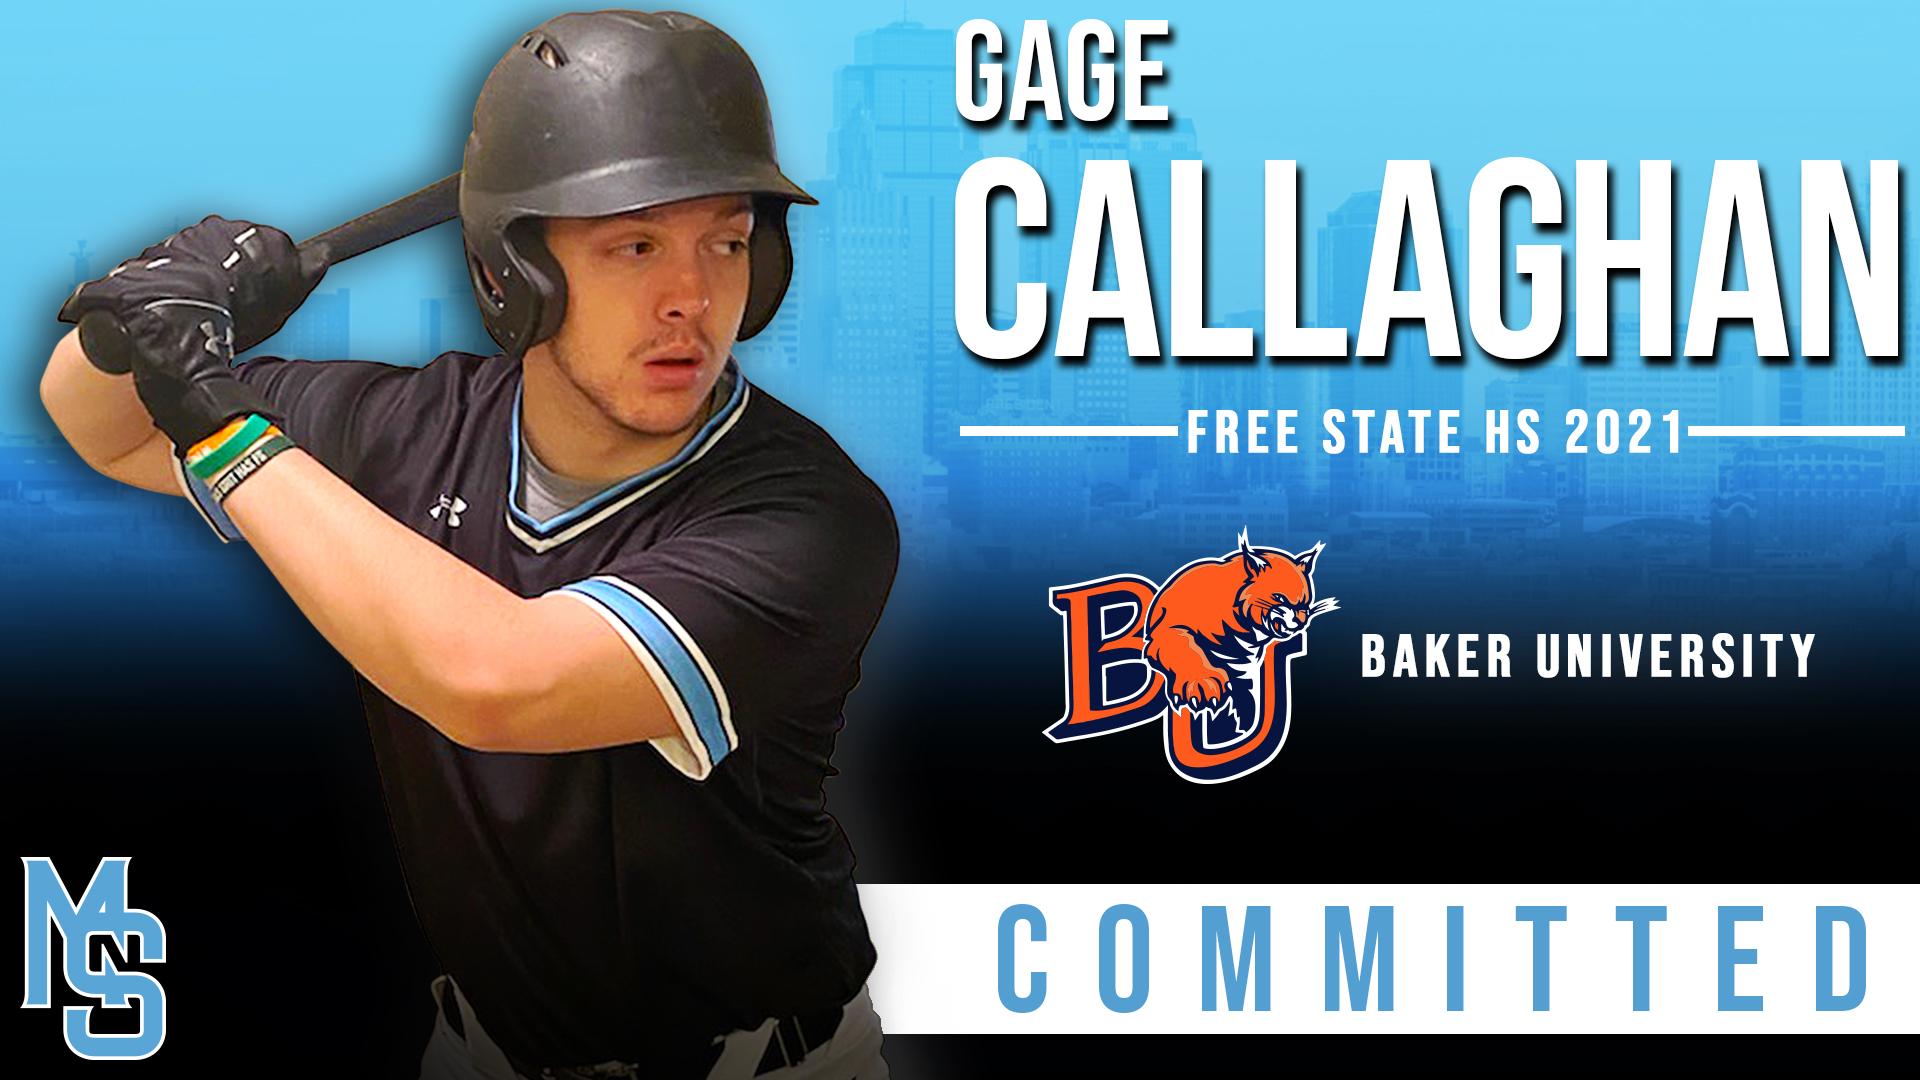 Gage Callaghan - 1920 x 1080